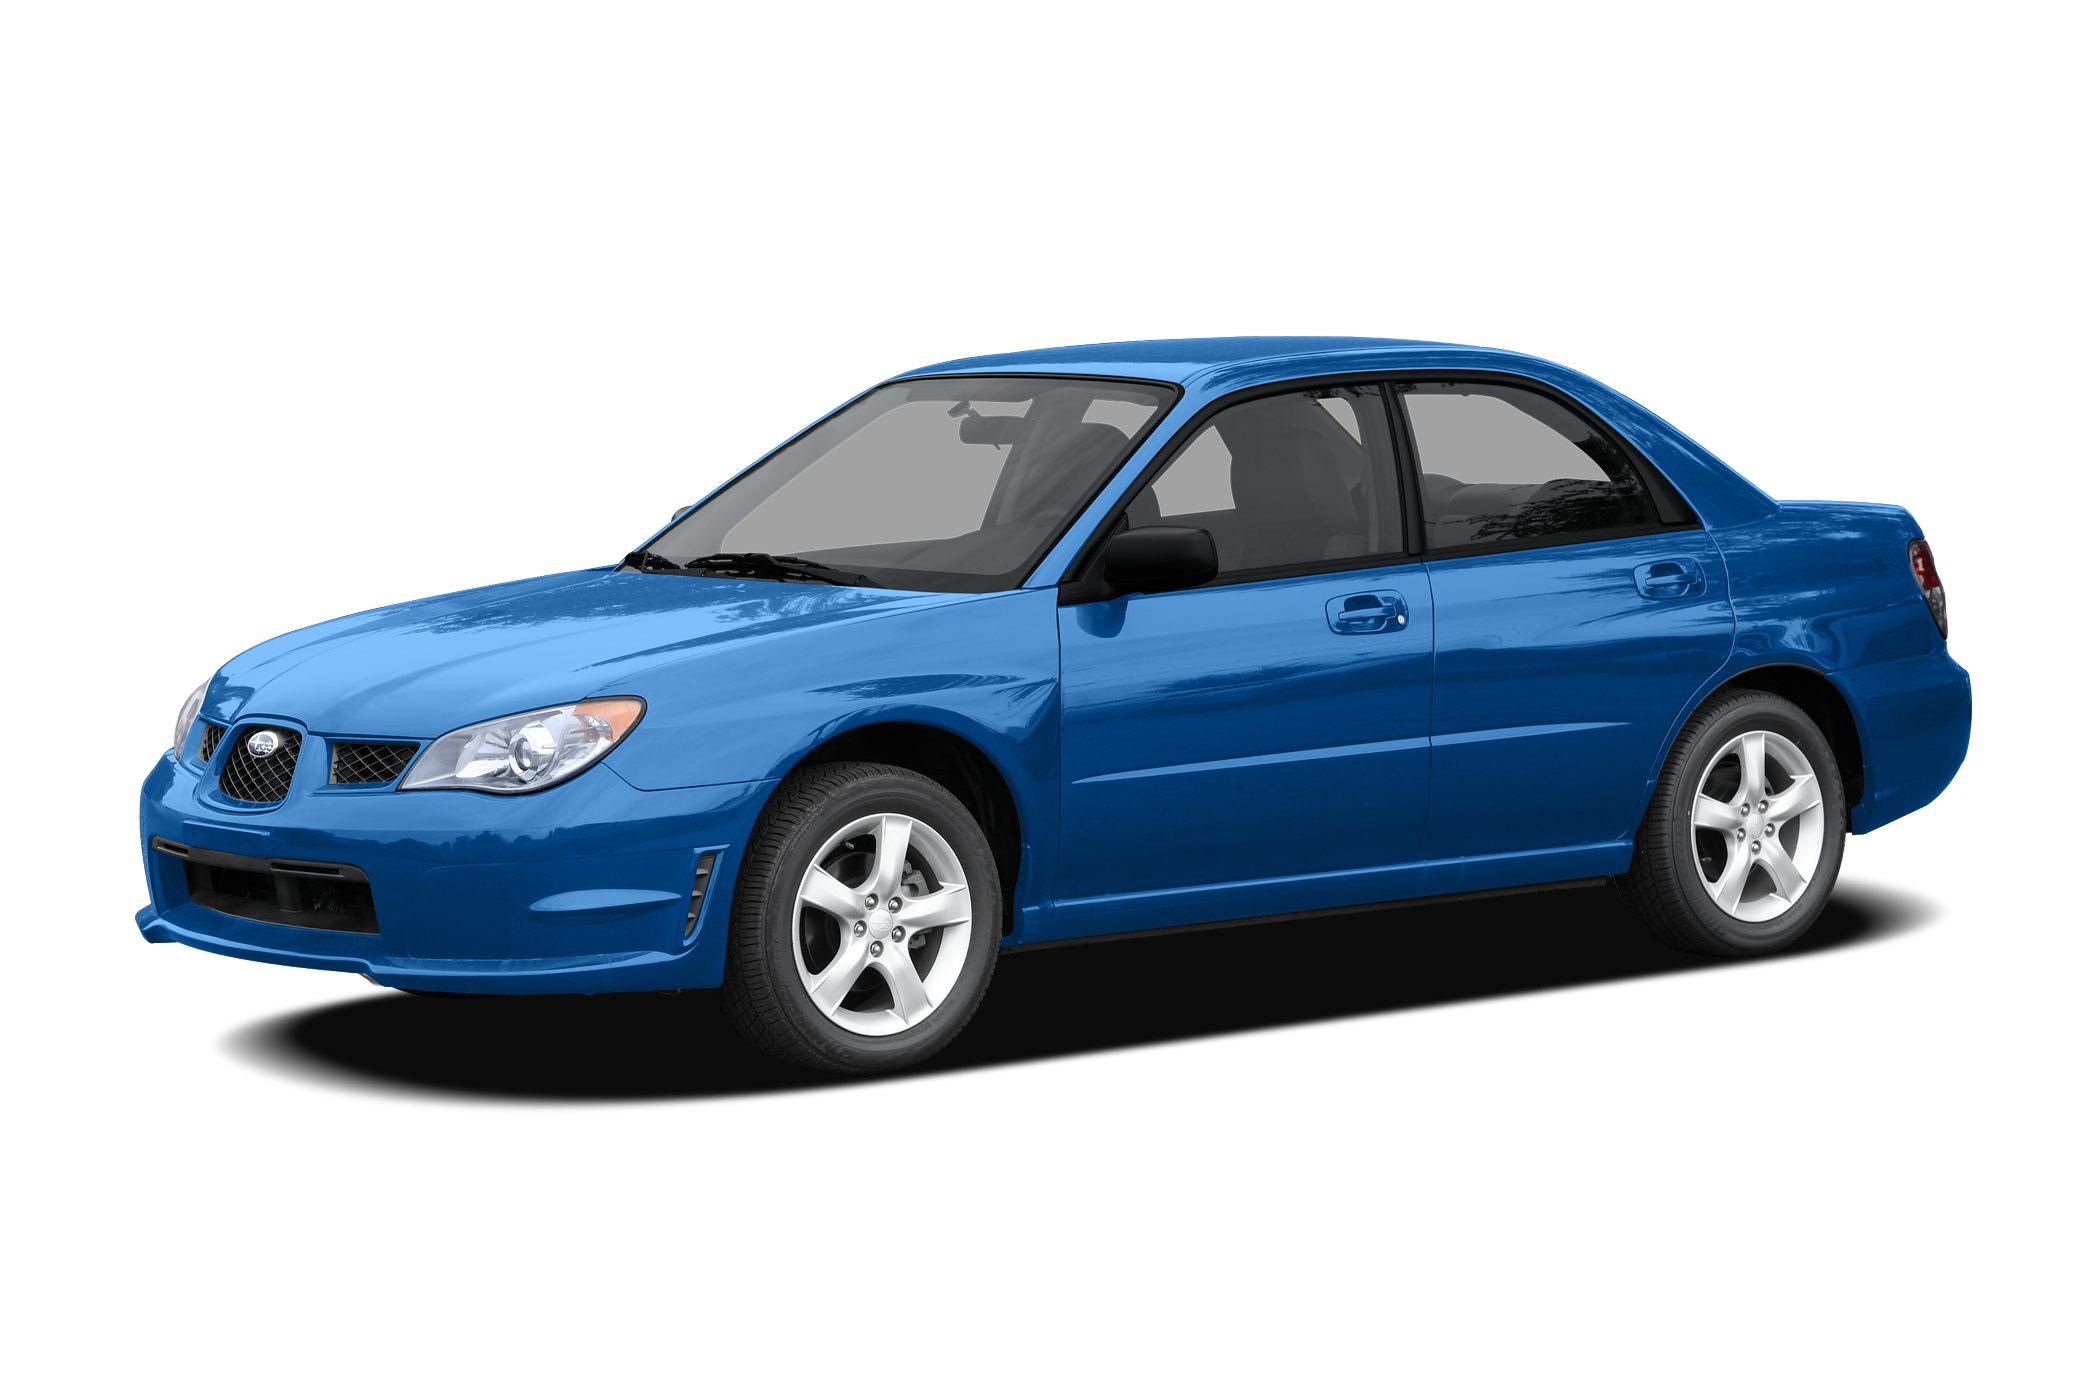 2007 Subaru Impreza Wrx >> 2007 Subaru Impreza Wrx Tr 4dr All Wheel Drive Sedan Pictures